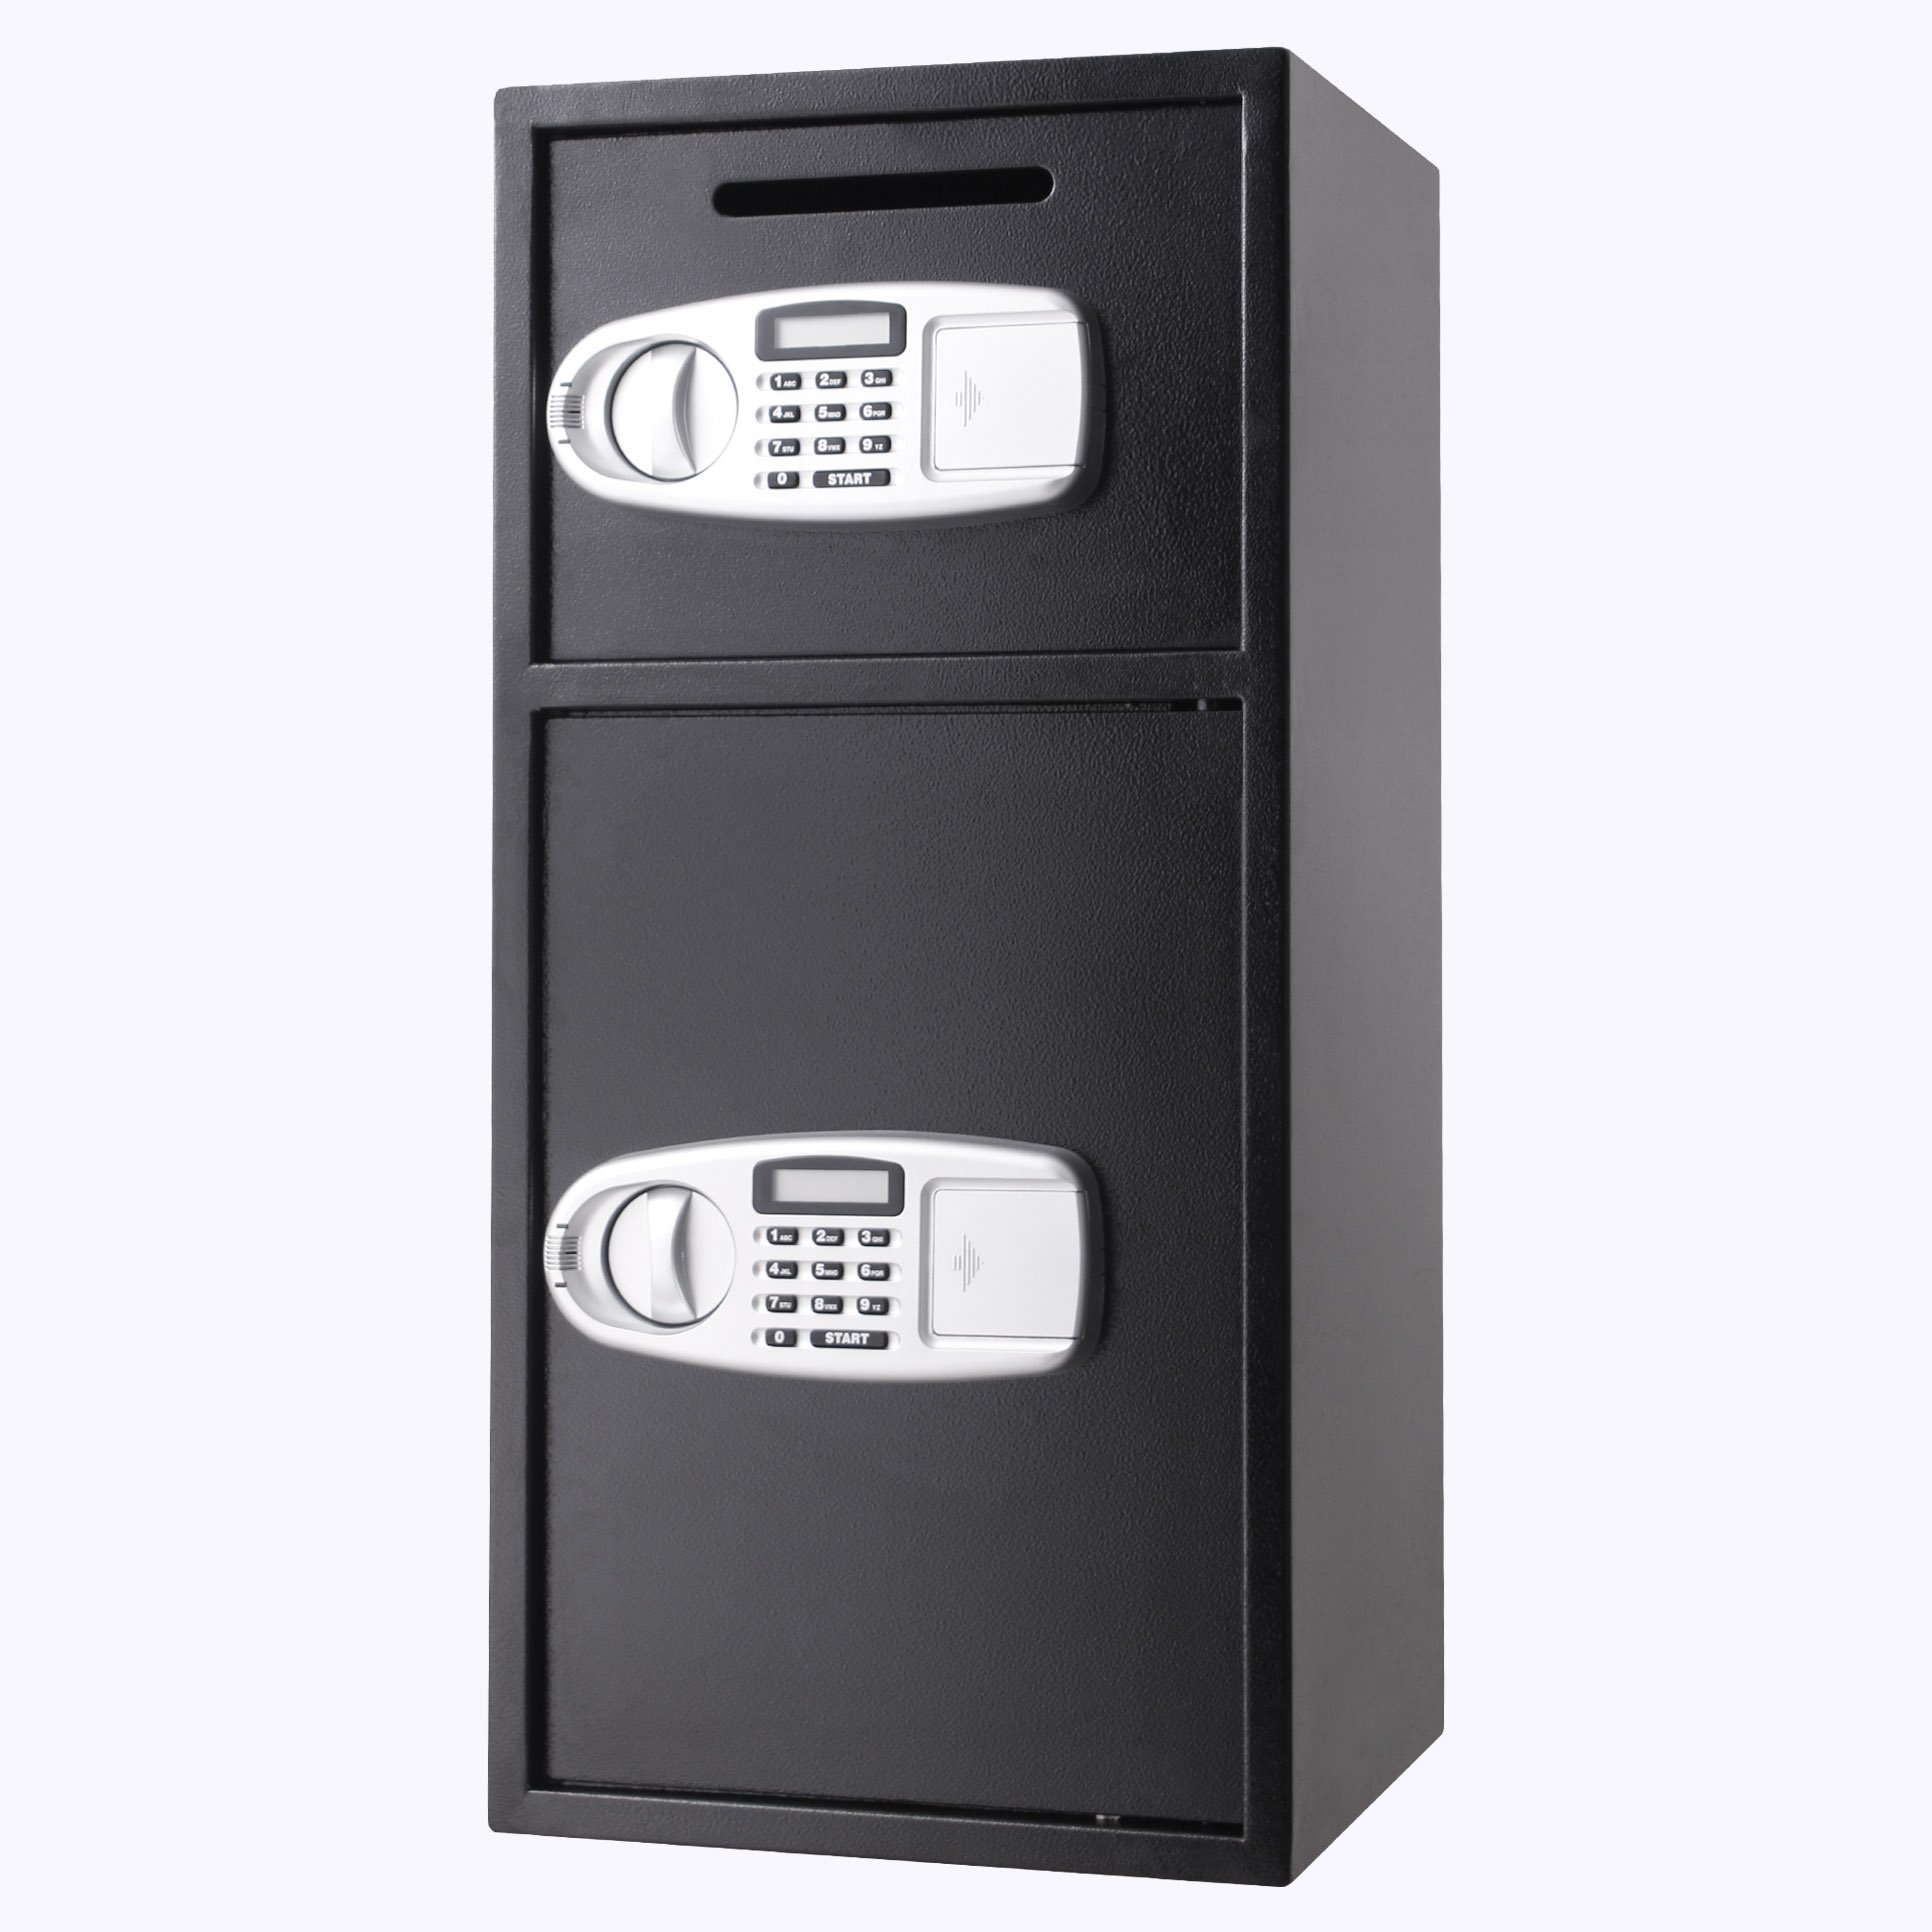 VEVOR Security Safe Box Double Door Digital Safe Depository for Money Gun Jewelry